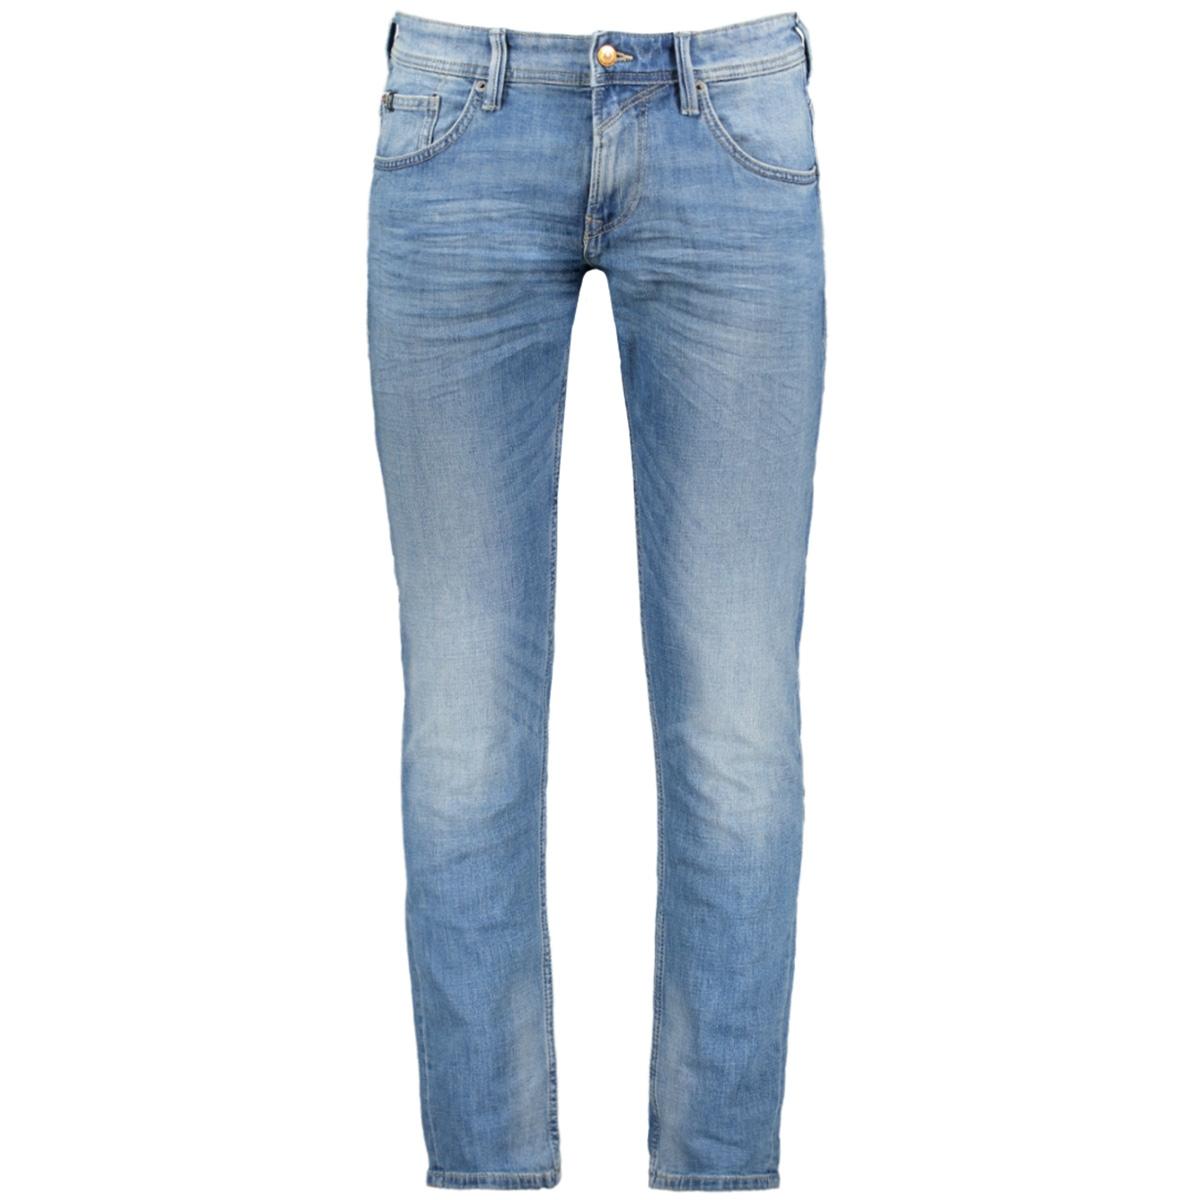 piers super slim jeans 1008458xx12 tom tailor jeans 10152